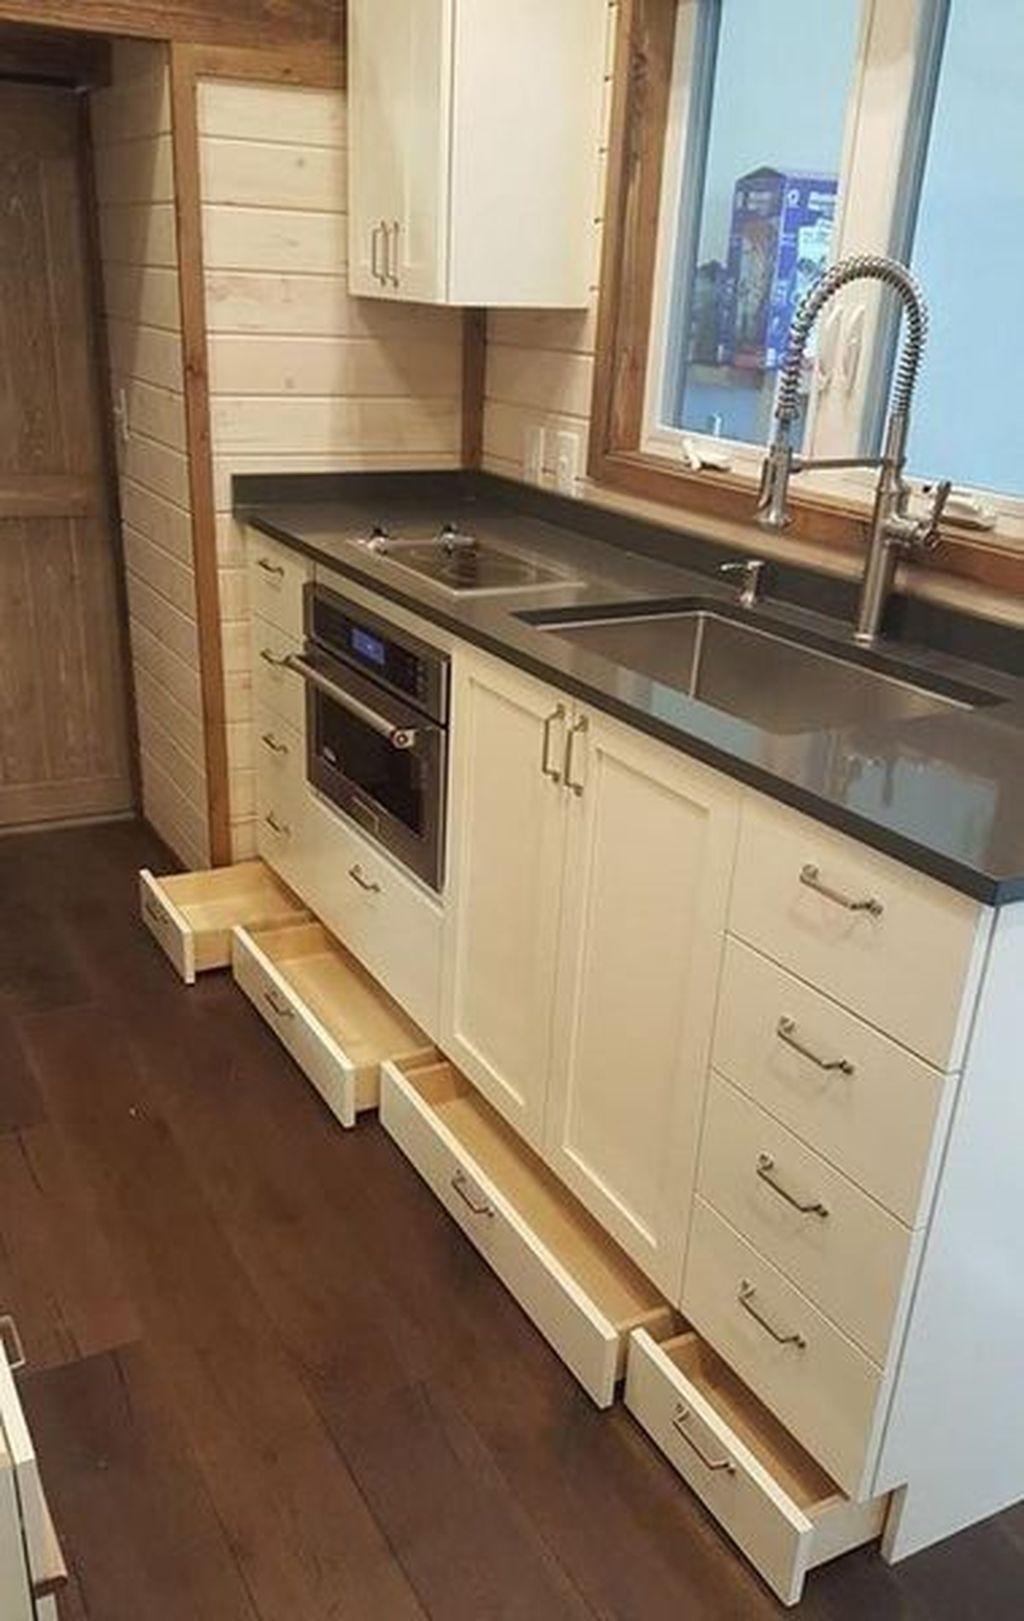 Stylish 30 Wonderful Kitchen Cabinets Ideas For Your Tiny House Homedecorideas Livingroom Bedroom I Tiny House Kitchen Kitchen Design Small Kitchen Layout